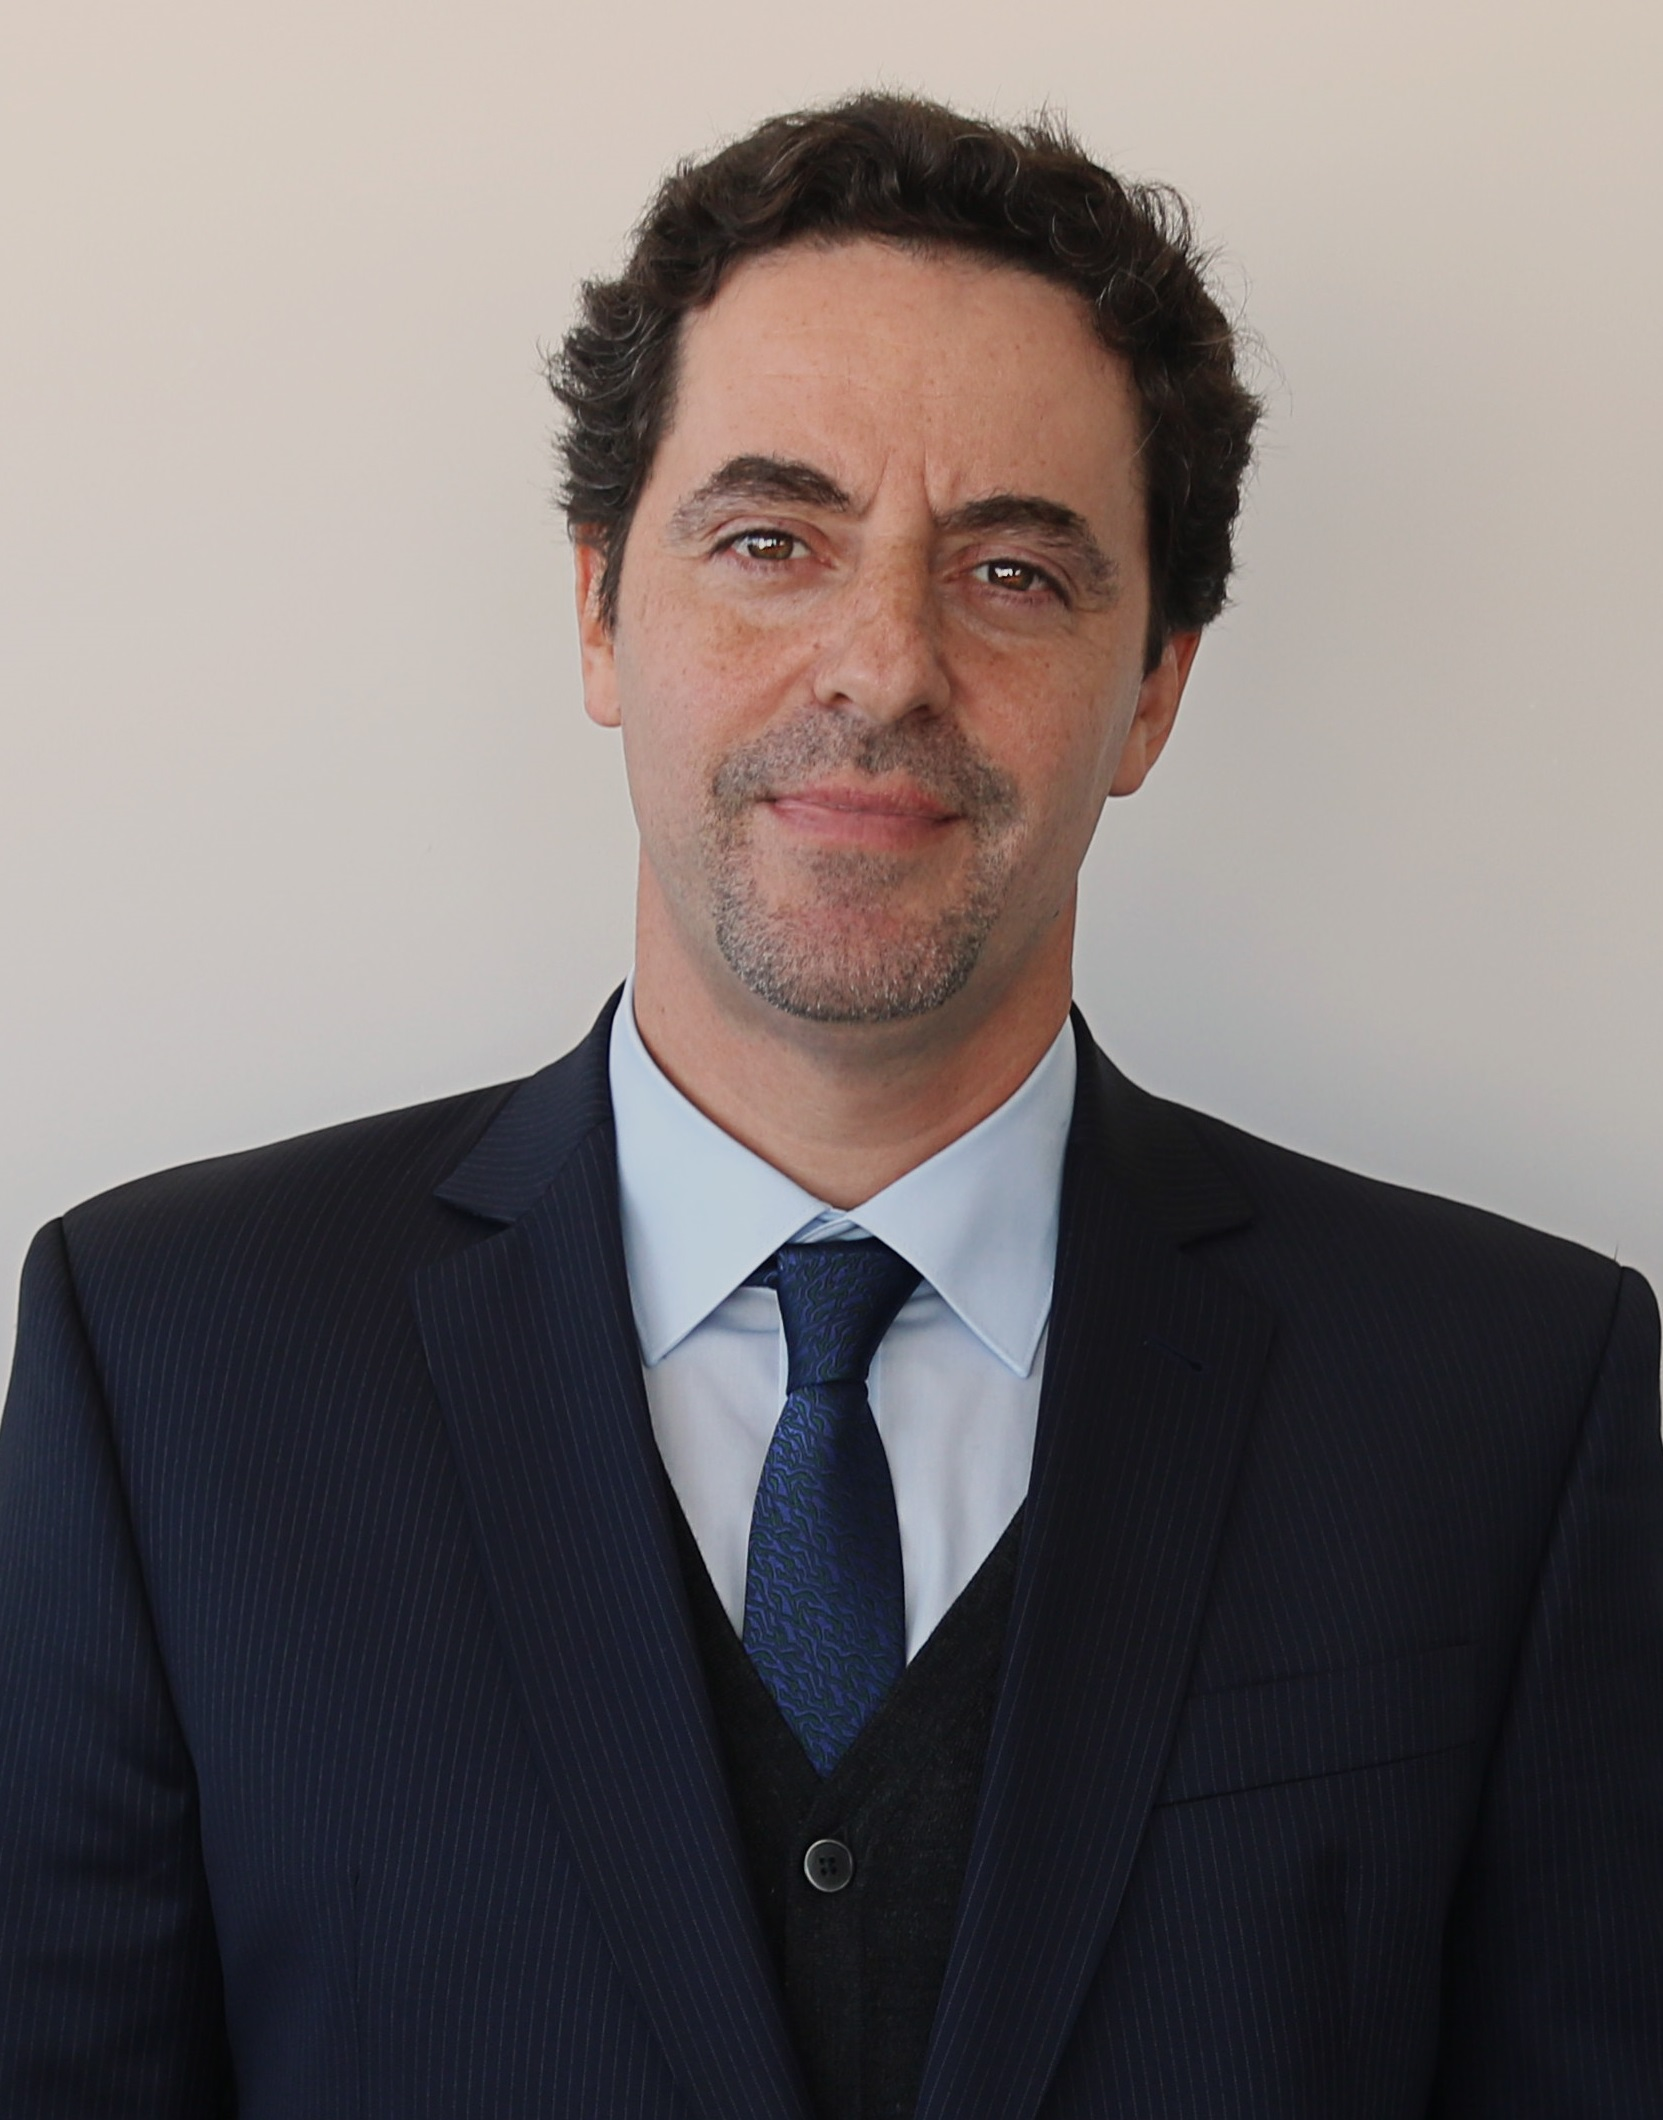 Zang Bergel returns to Brons & Salas for new tax head